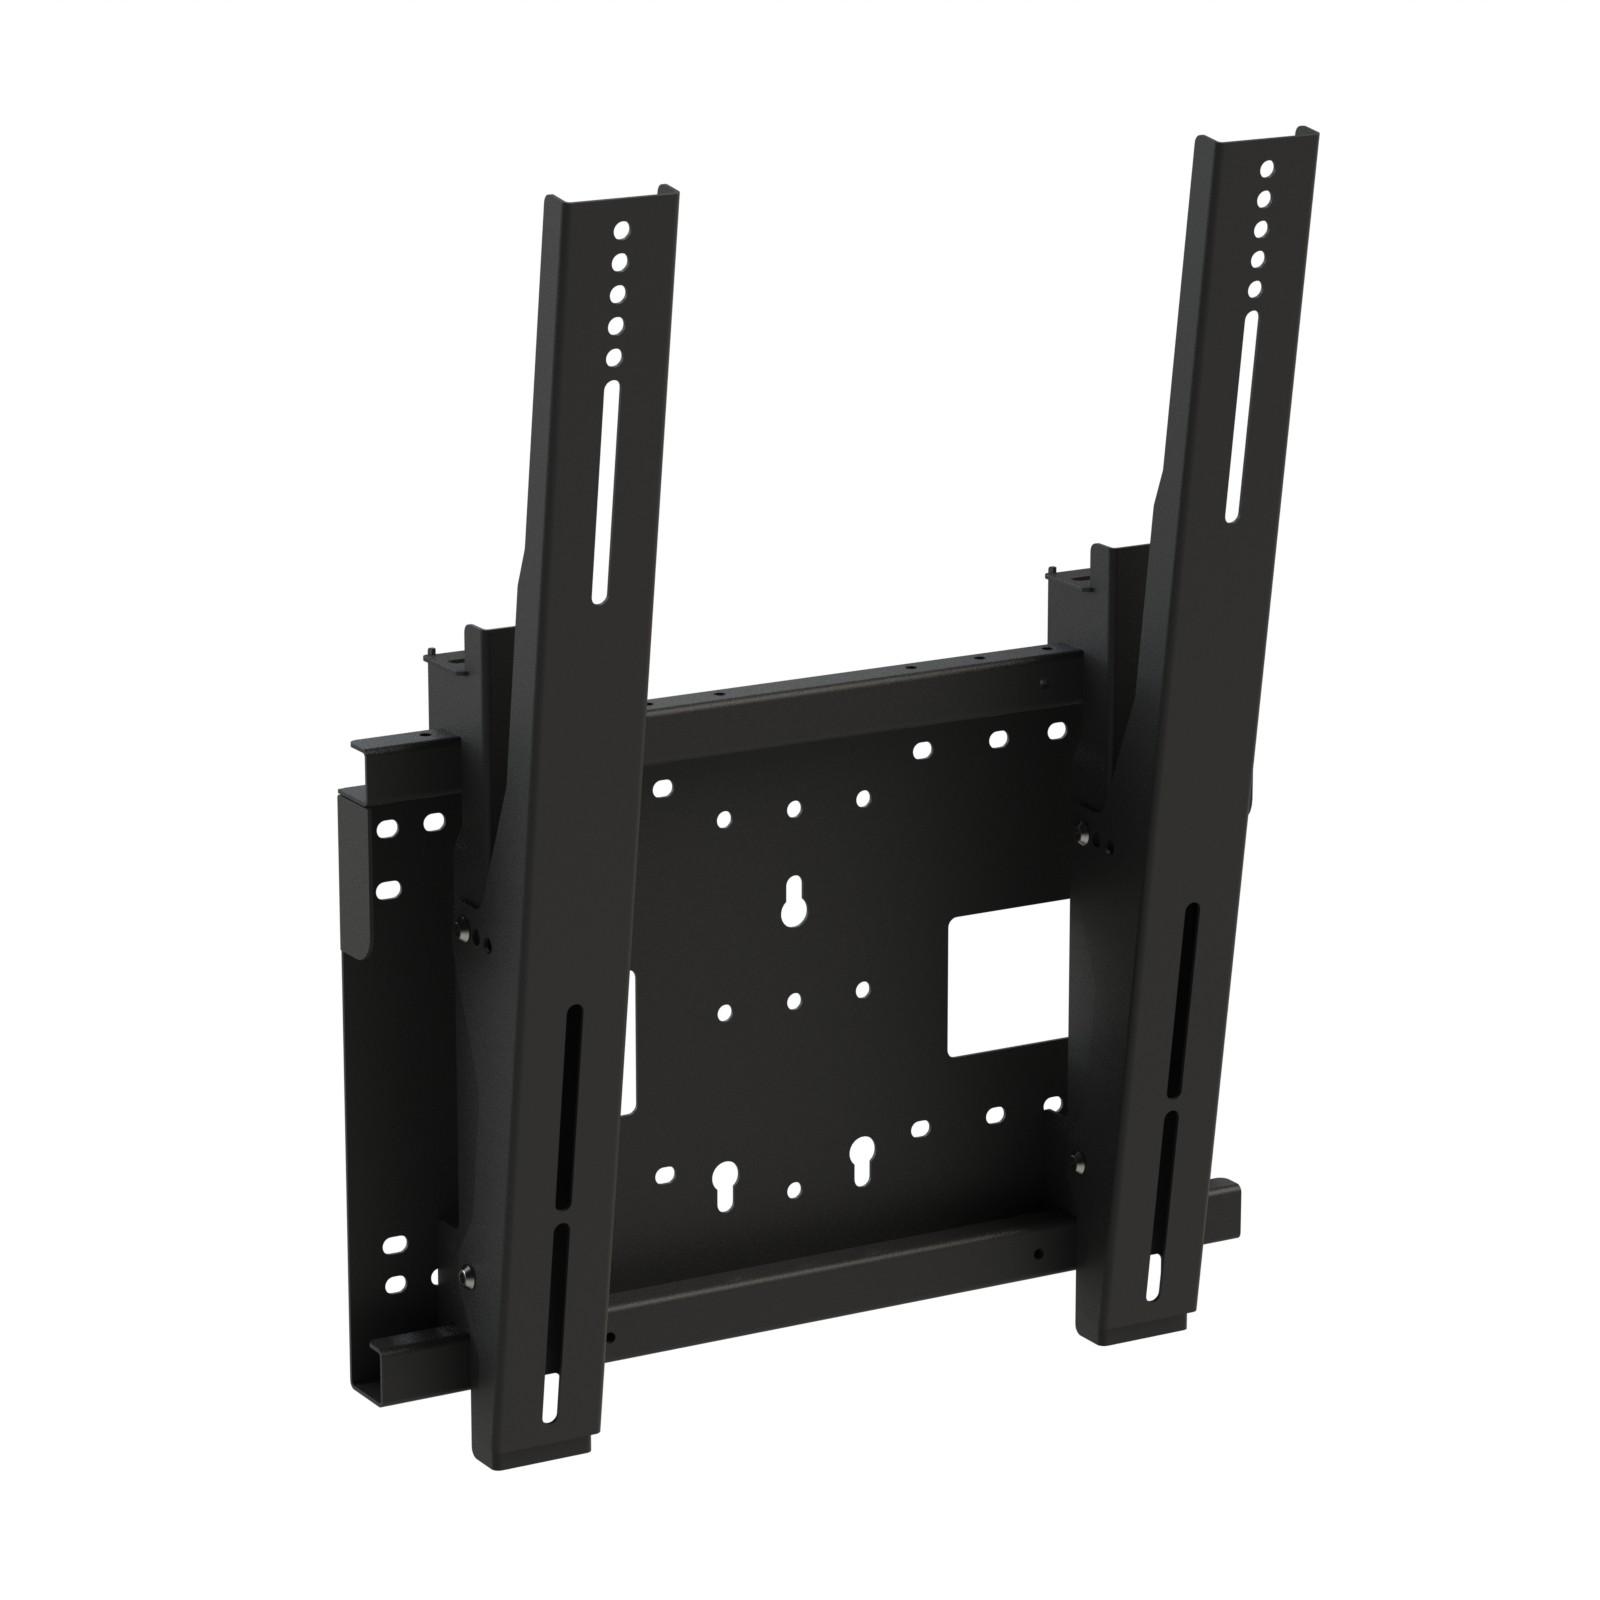 Heavy Duty Screen Wall Mount With 7 5 Deg Tilt Up To 400mm